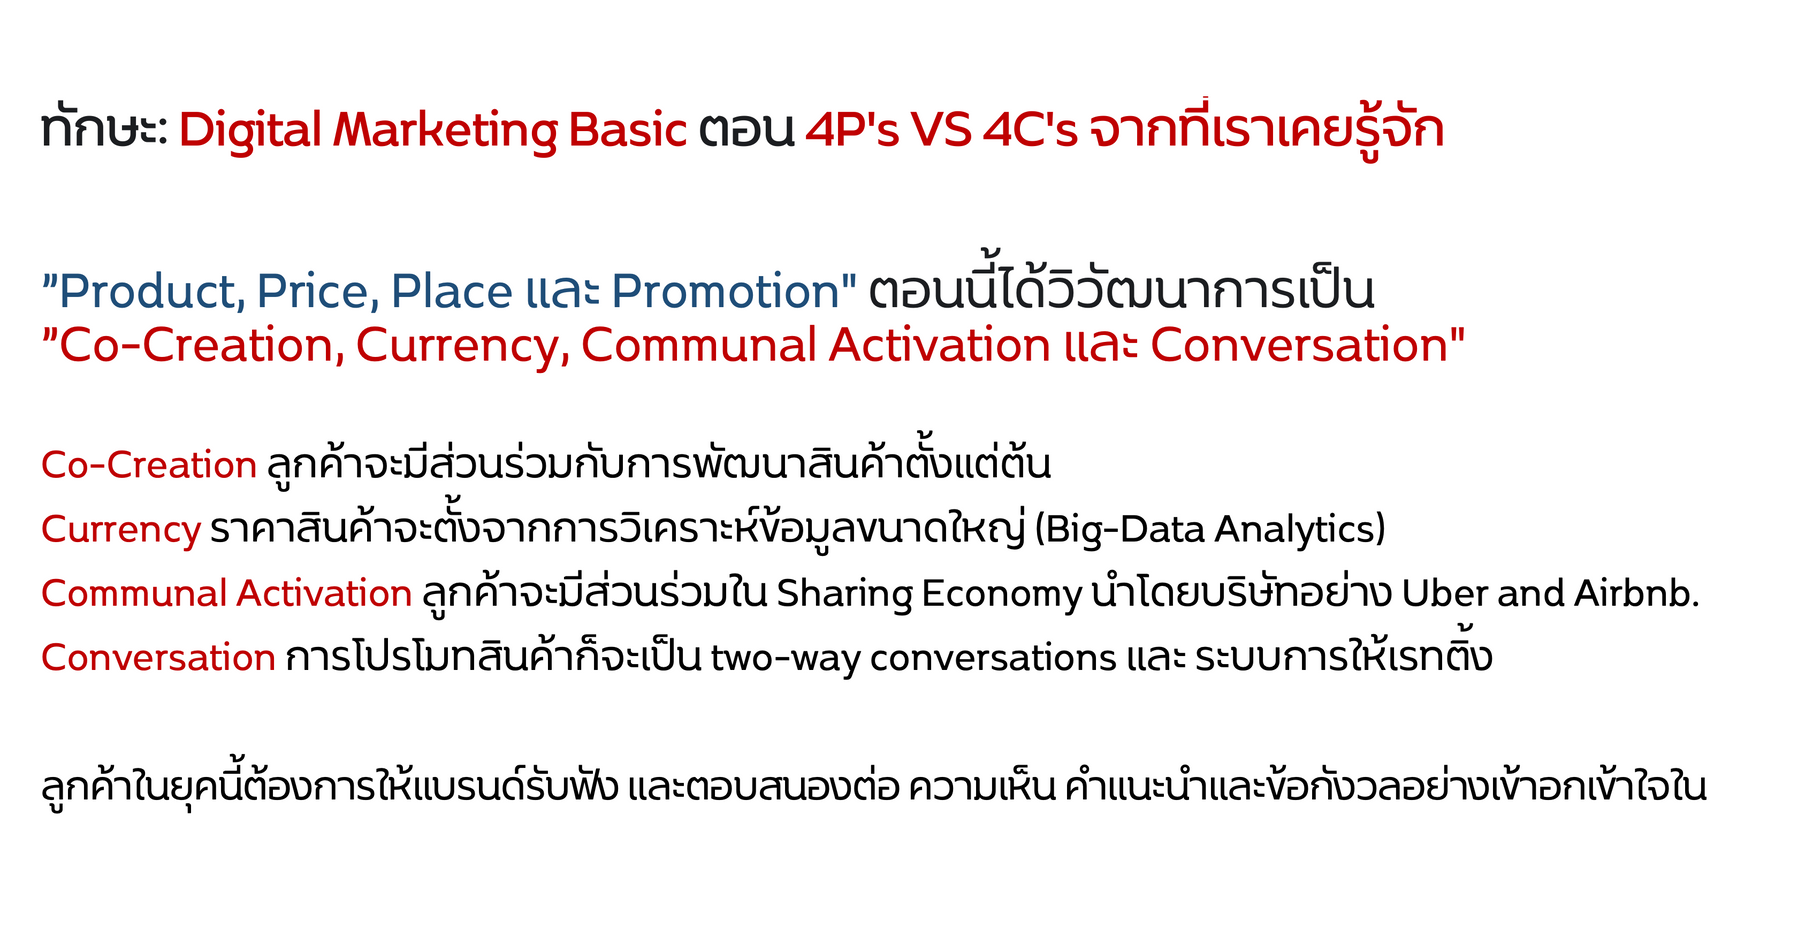 Marketing 4.0#1